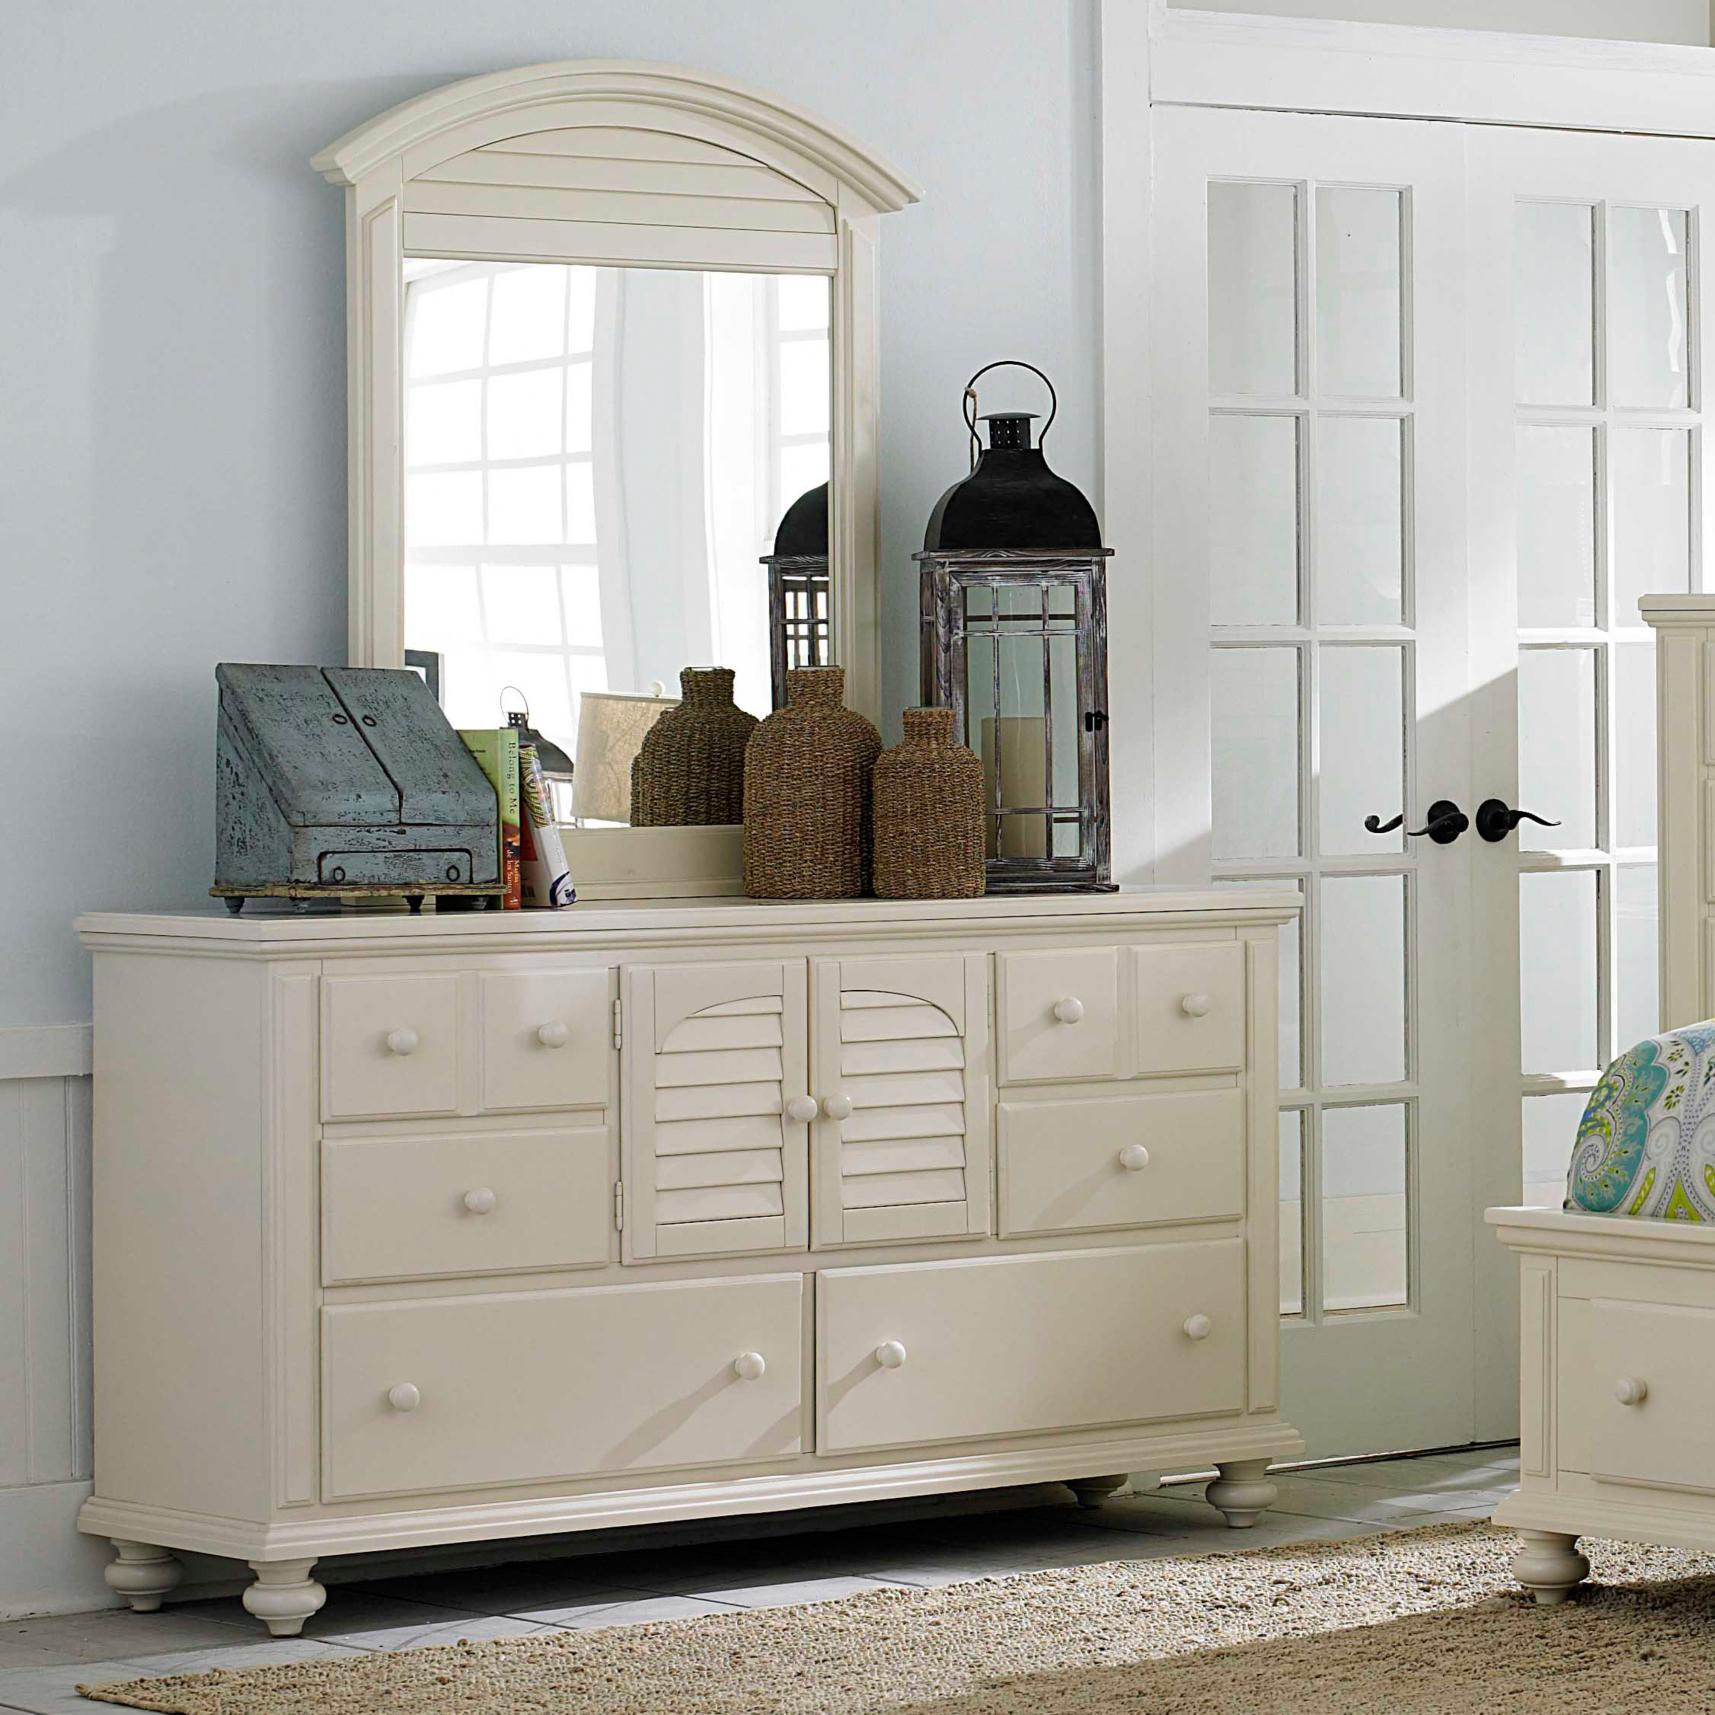 Broyhill Furniture Seabrooke Dresser & Mirror - Item Number: 4471-232+236